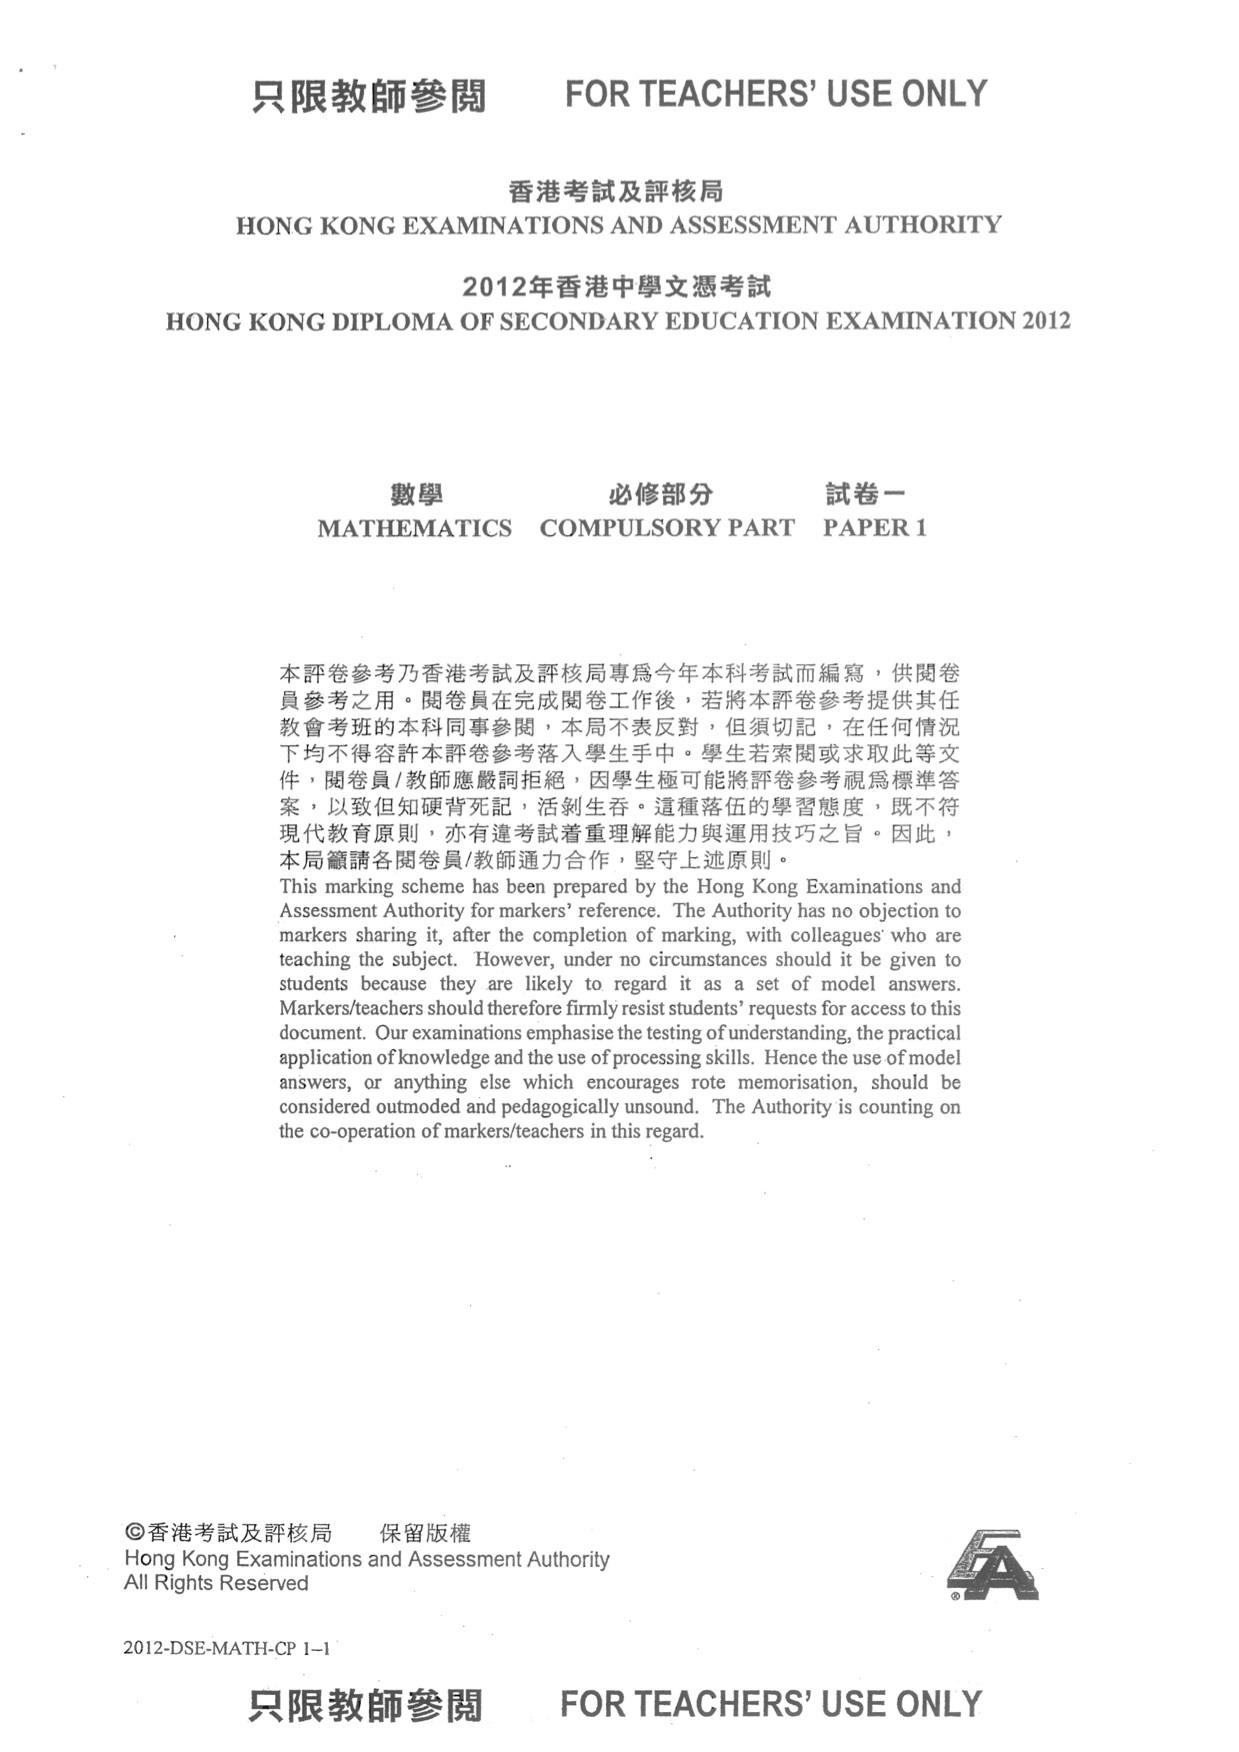 [2012DSE] Mathematics Compulsory Part數學必修部分 Past paper – 公開試資源庫